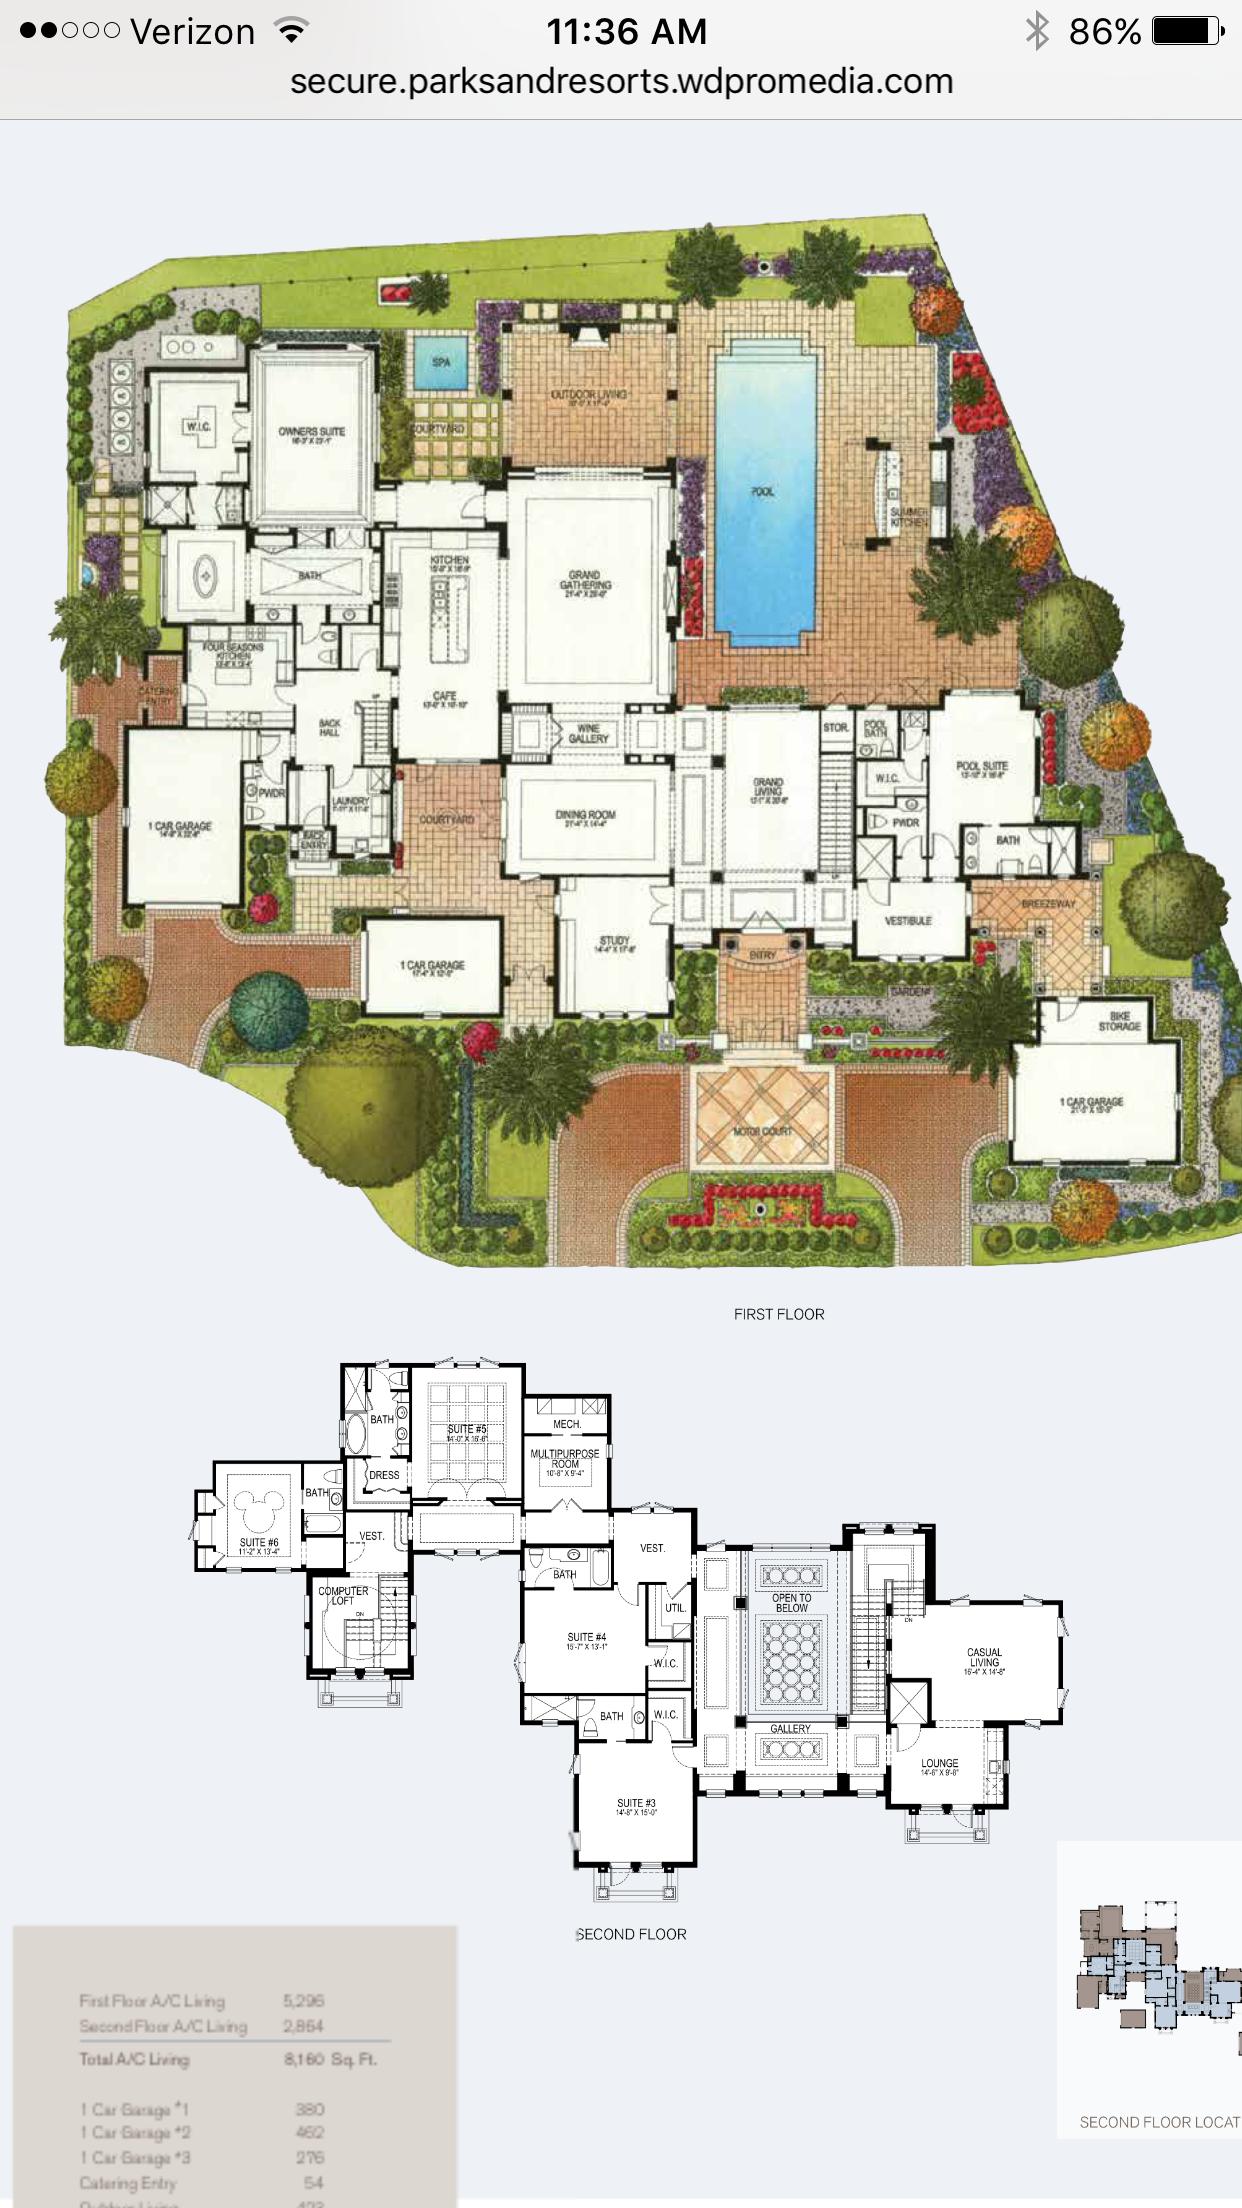 5858f36c2908448ec82392b420b2c93d Png 1242 2208 Dream House Plans Mansion Floor Plan Luxury House Plans